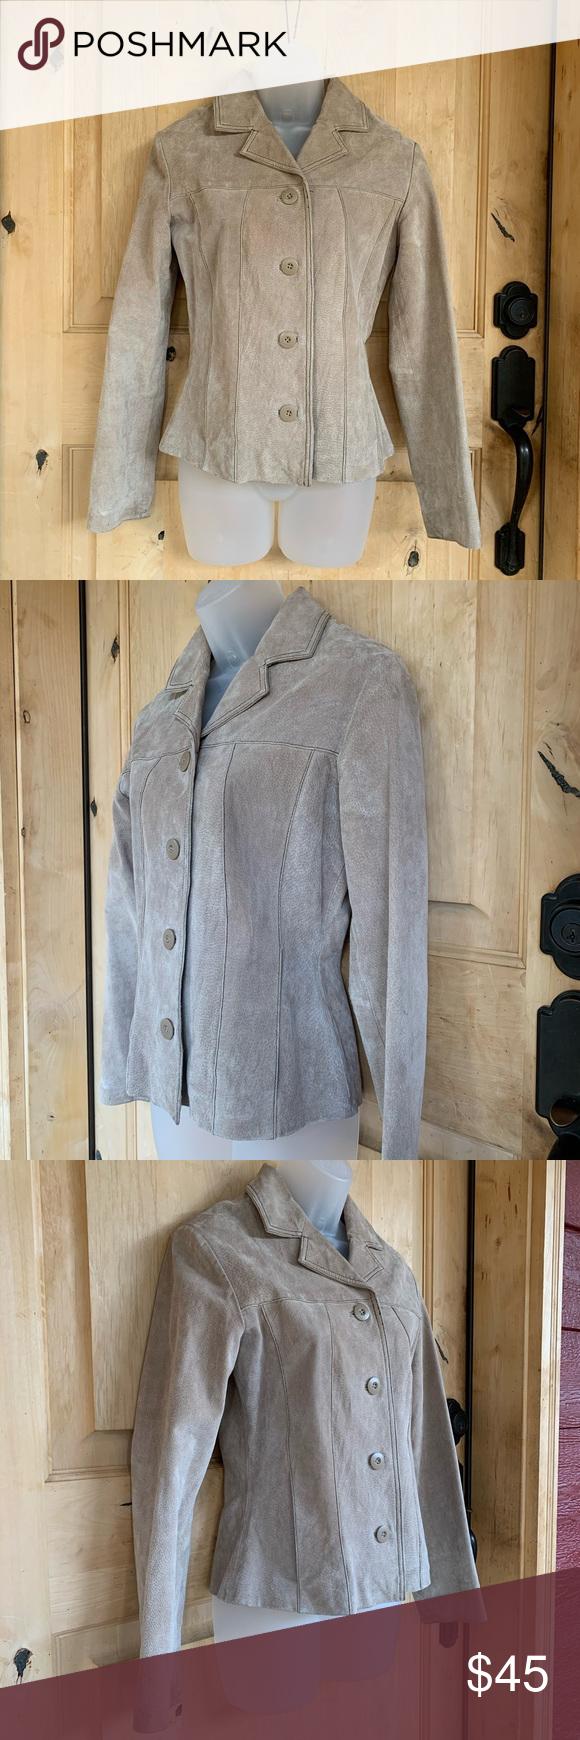 Wilsons Leather Maxima Jacket Wilsons leather, Jacket